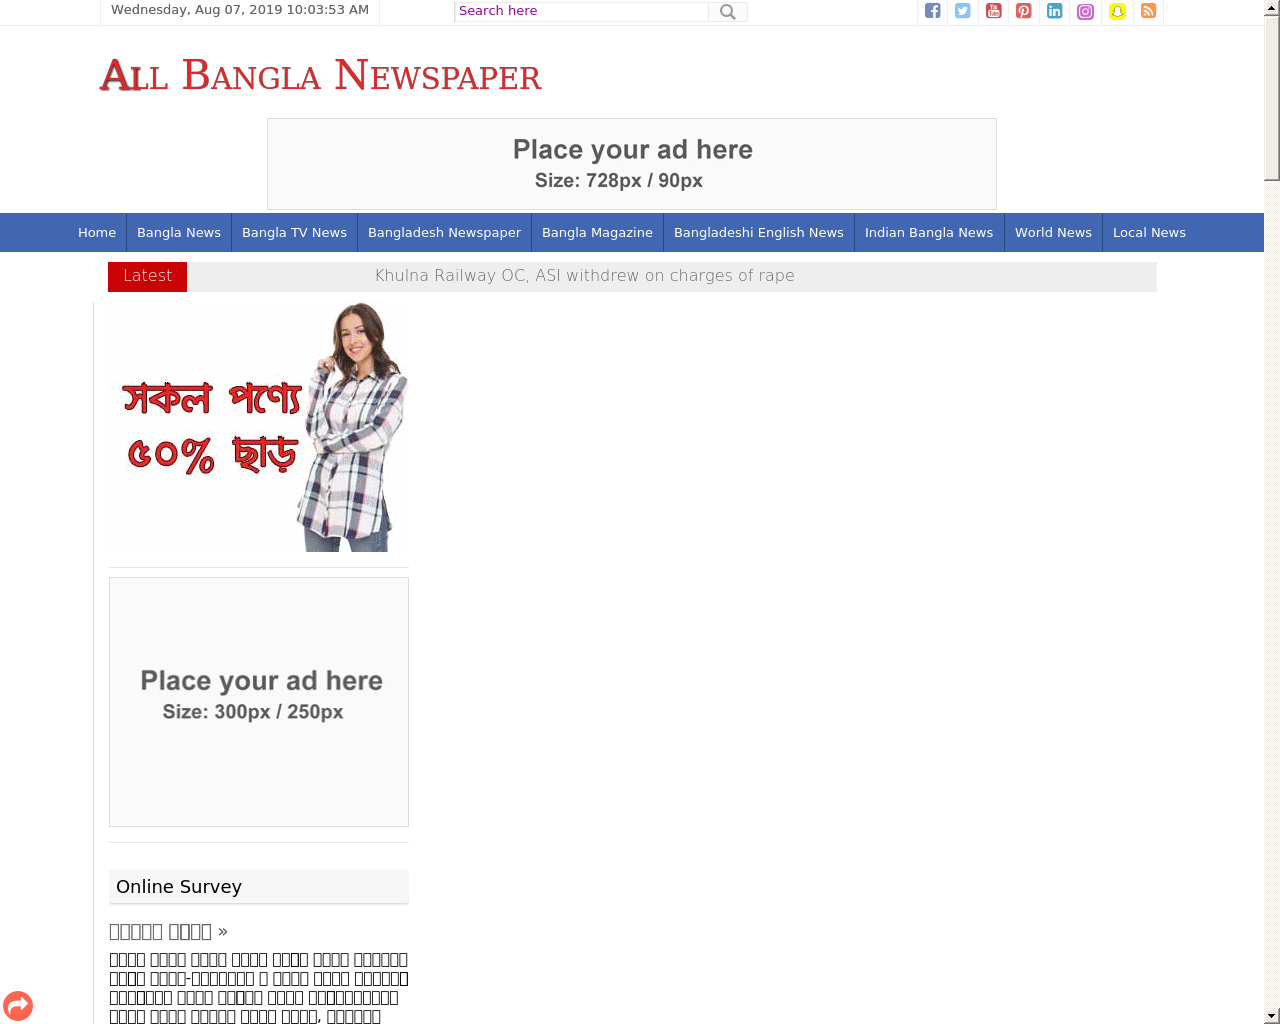 ALL BANGLA NEWSPAPER Advertising Mediakits, Reviews, Pricing